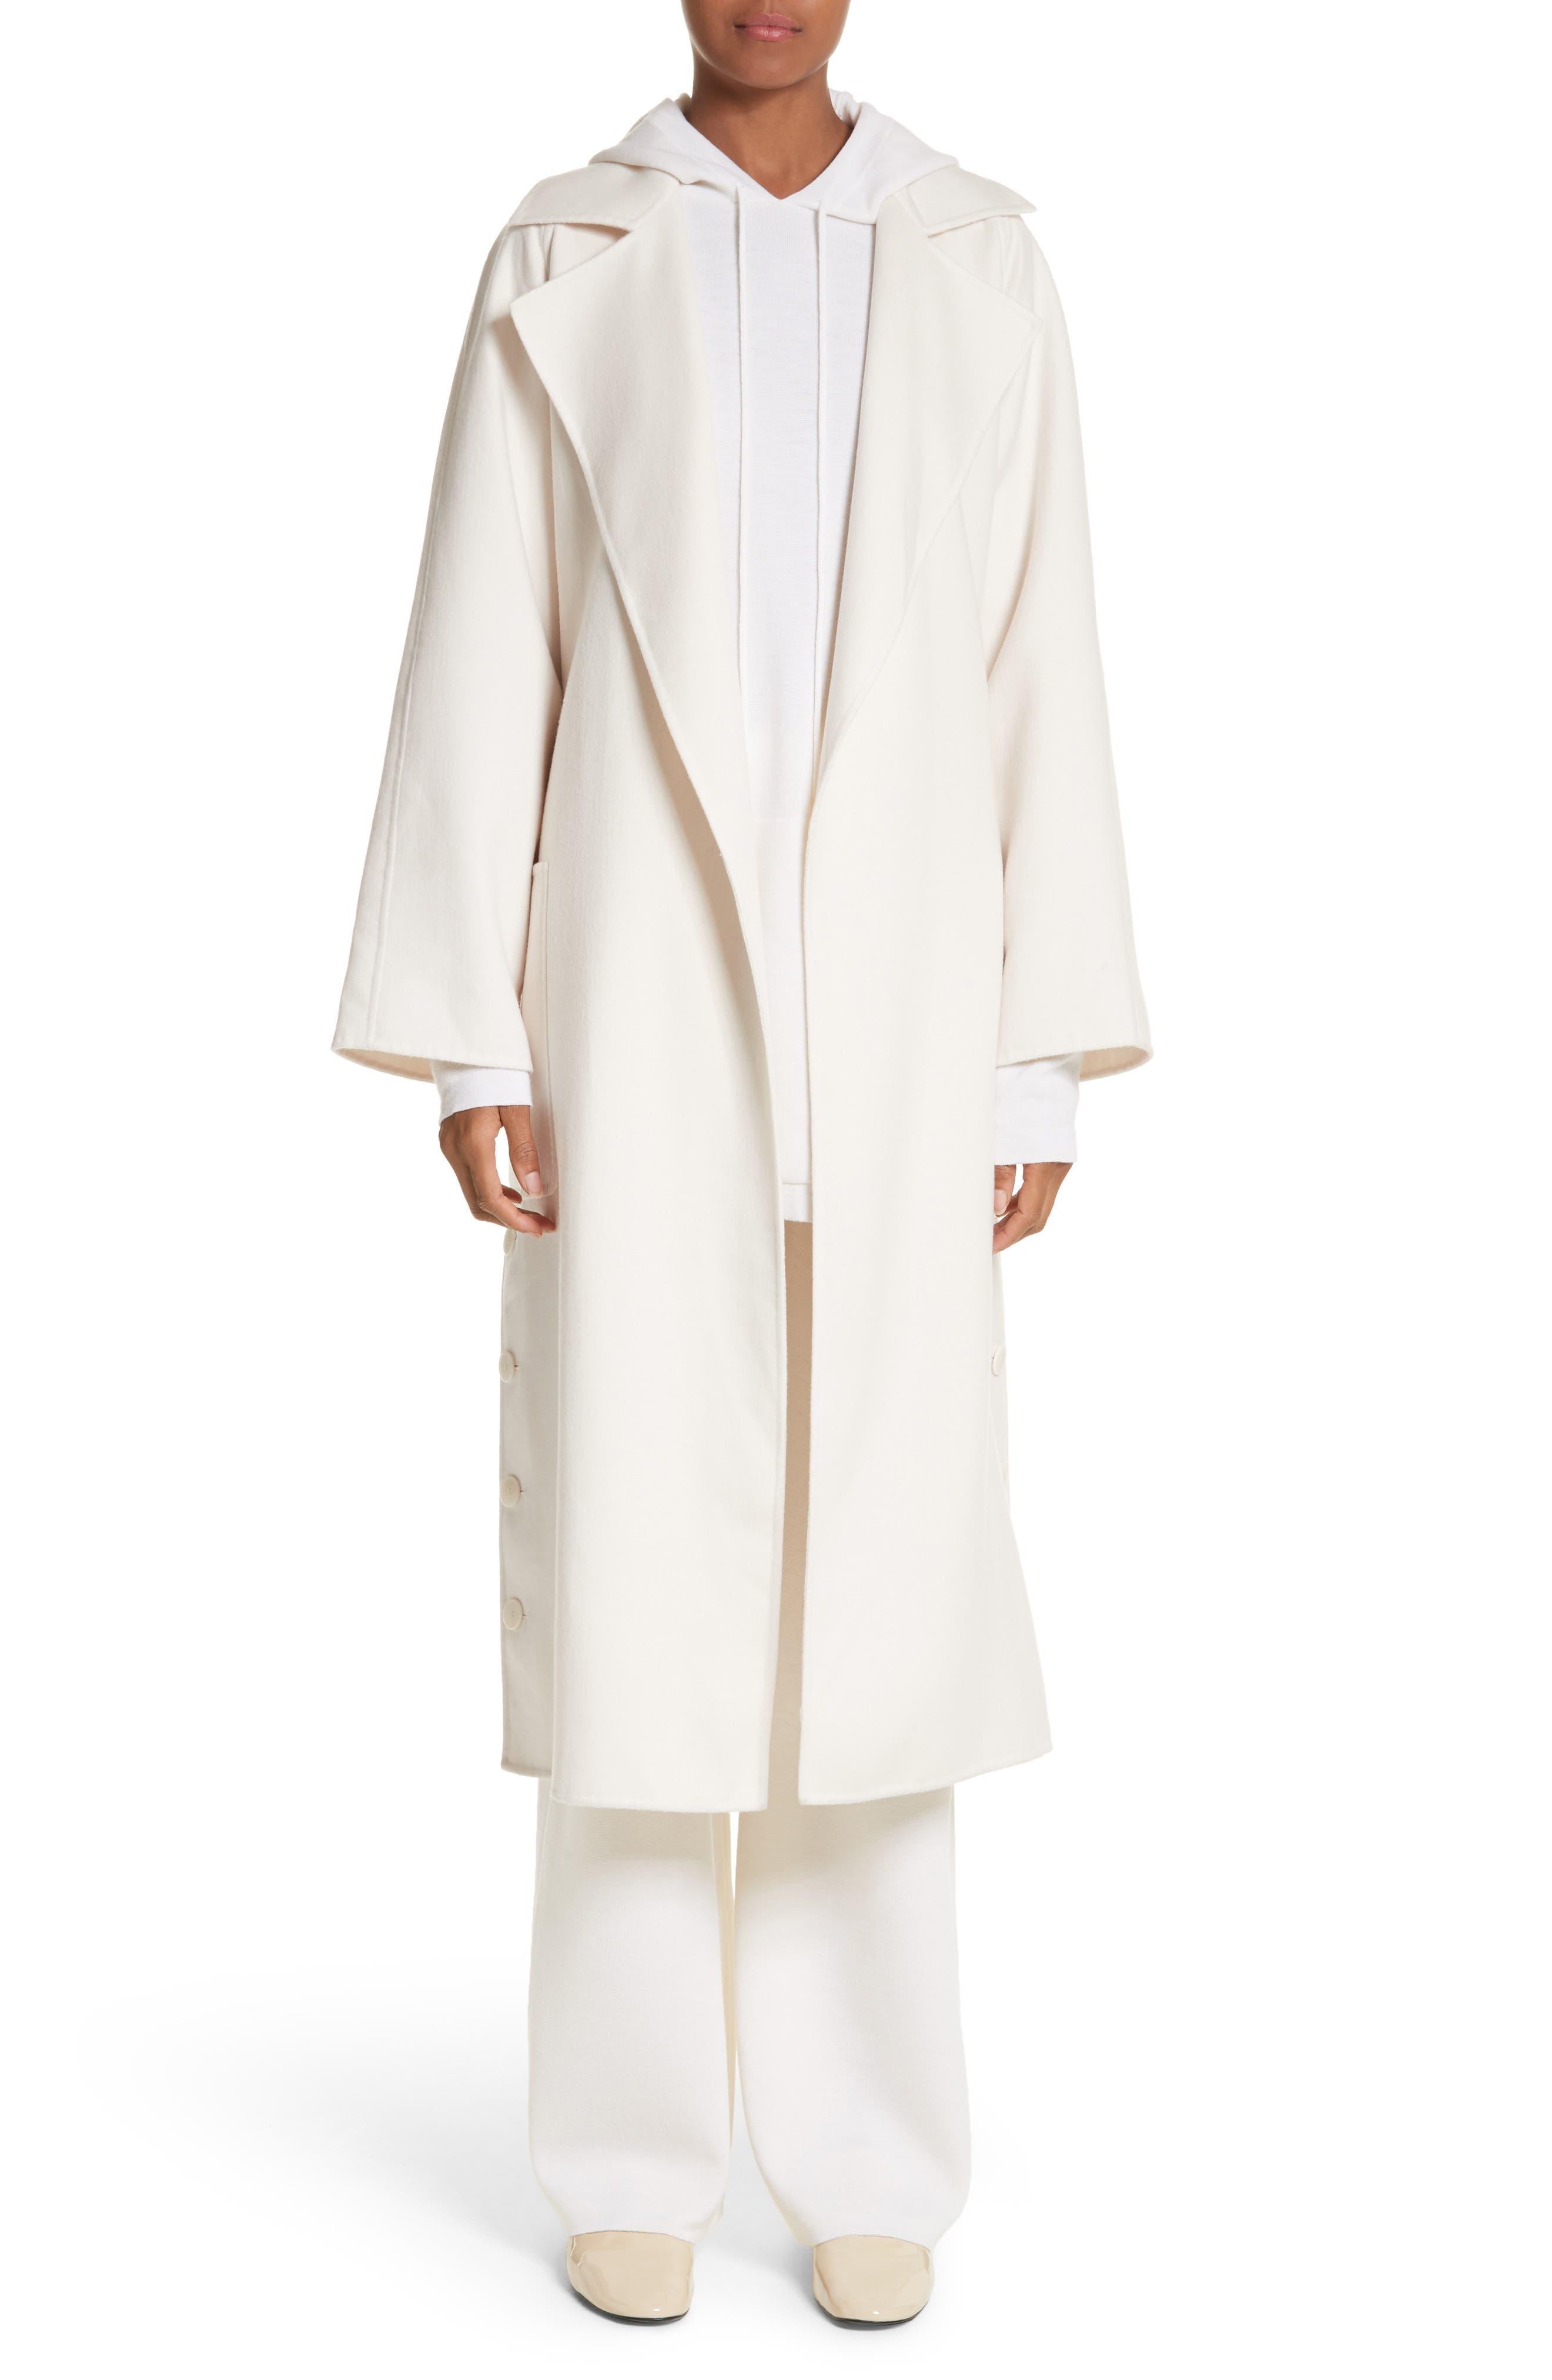 Max Mara Alacre Wool & Cashmere Coat